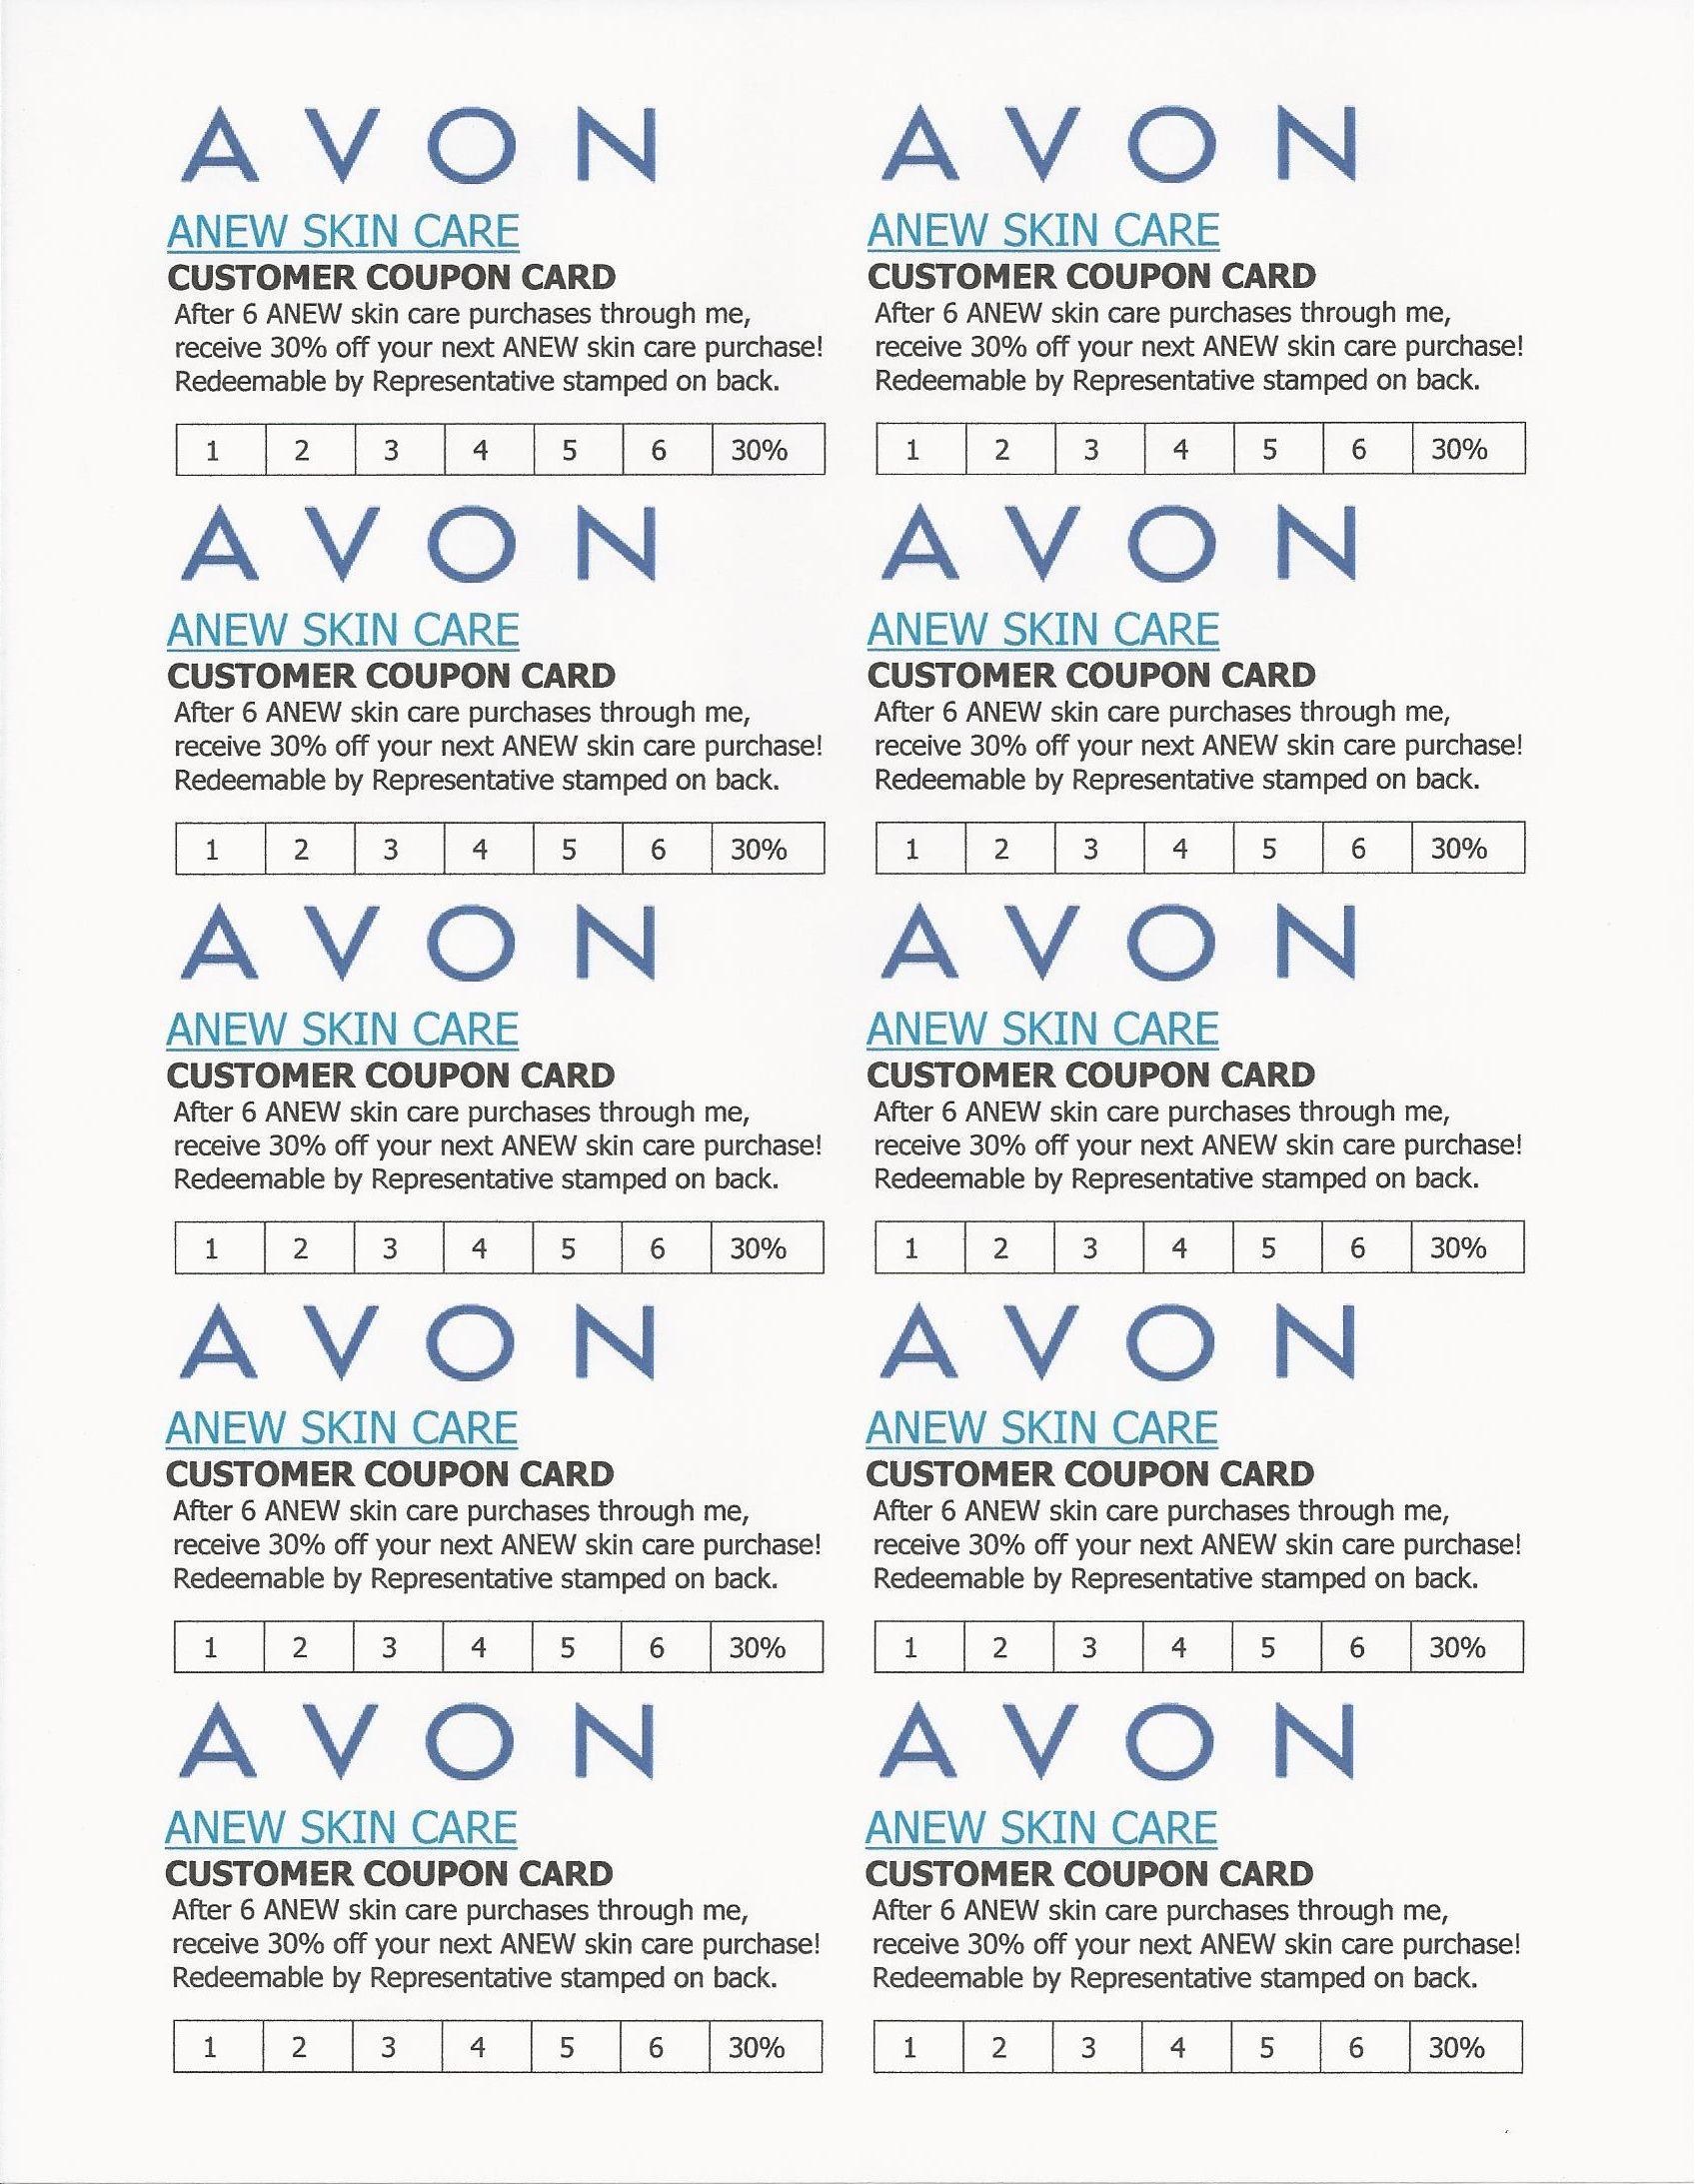 Avon discount coupons